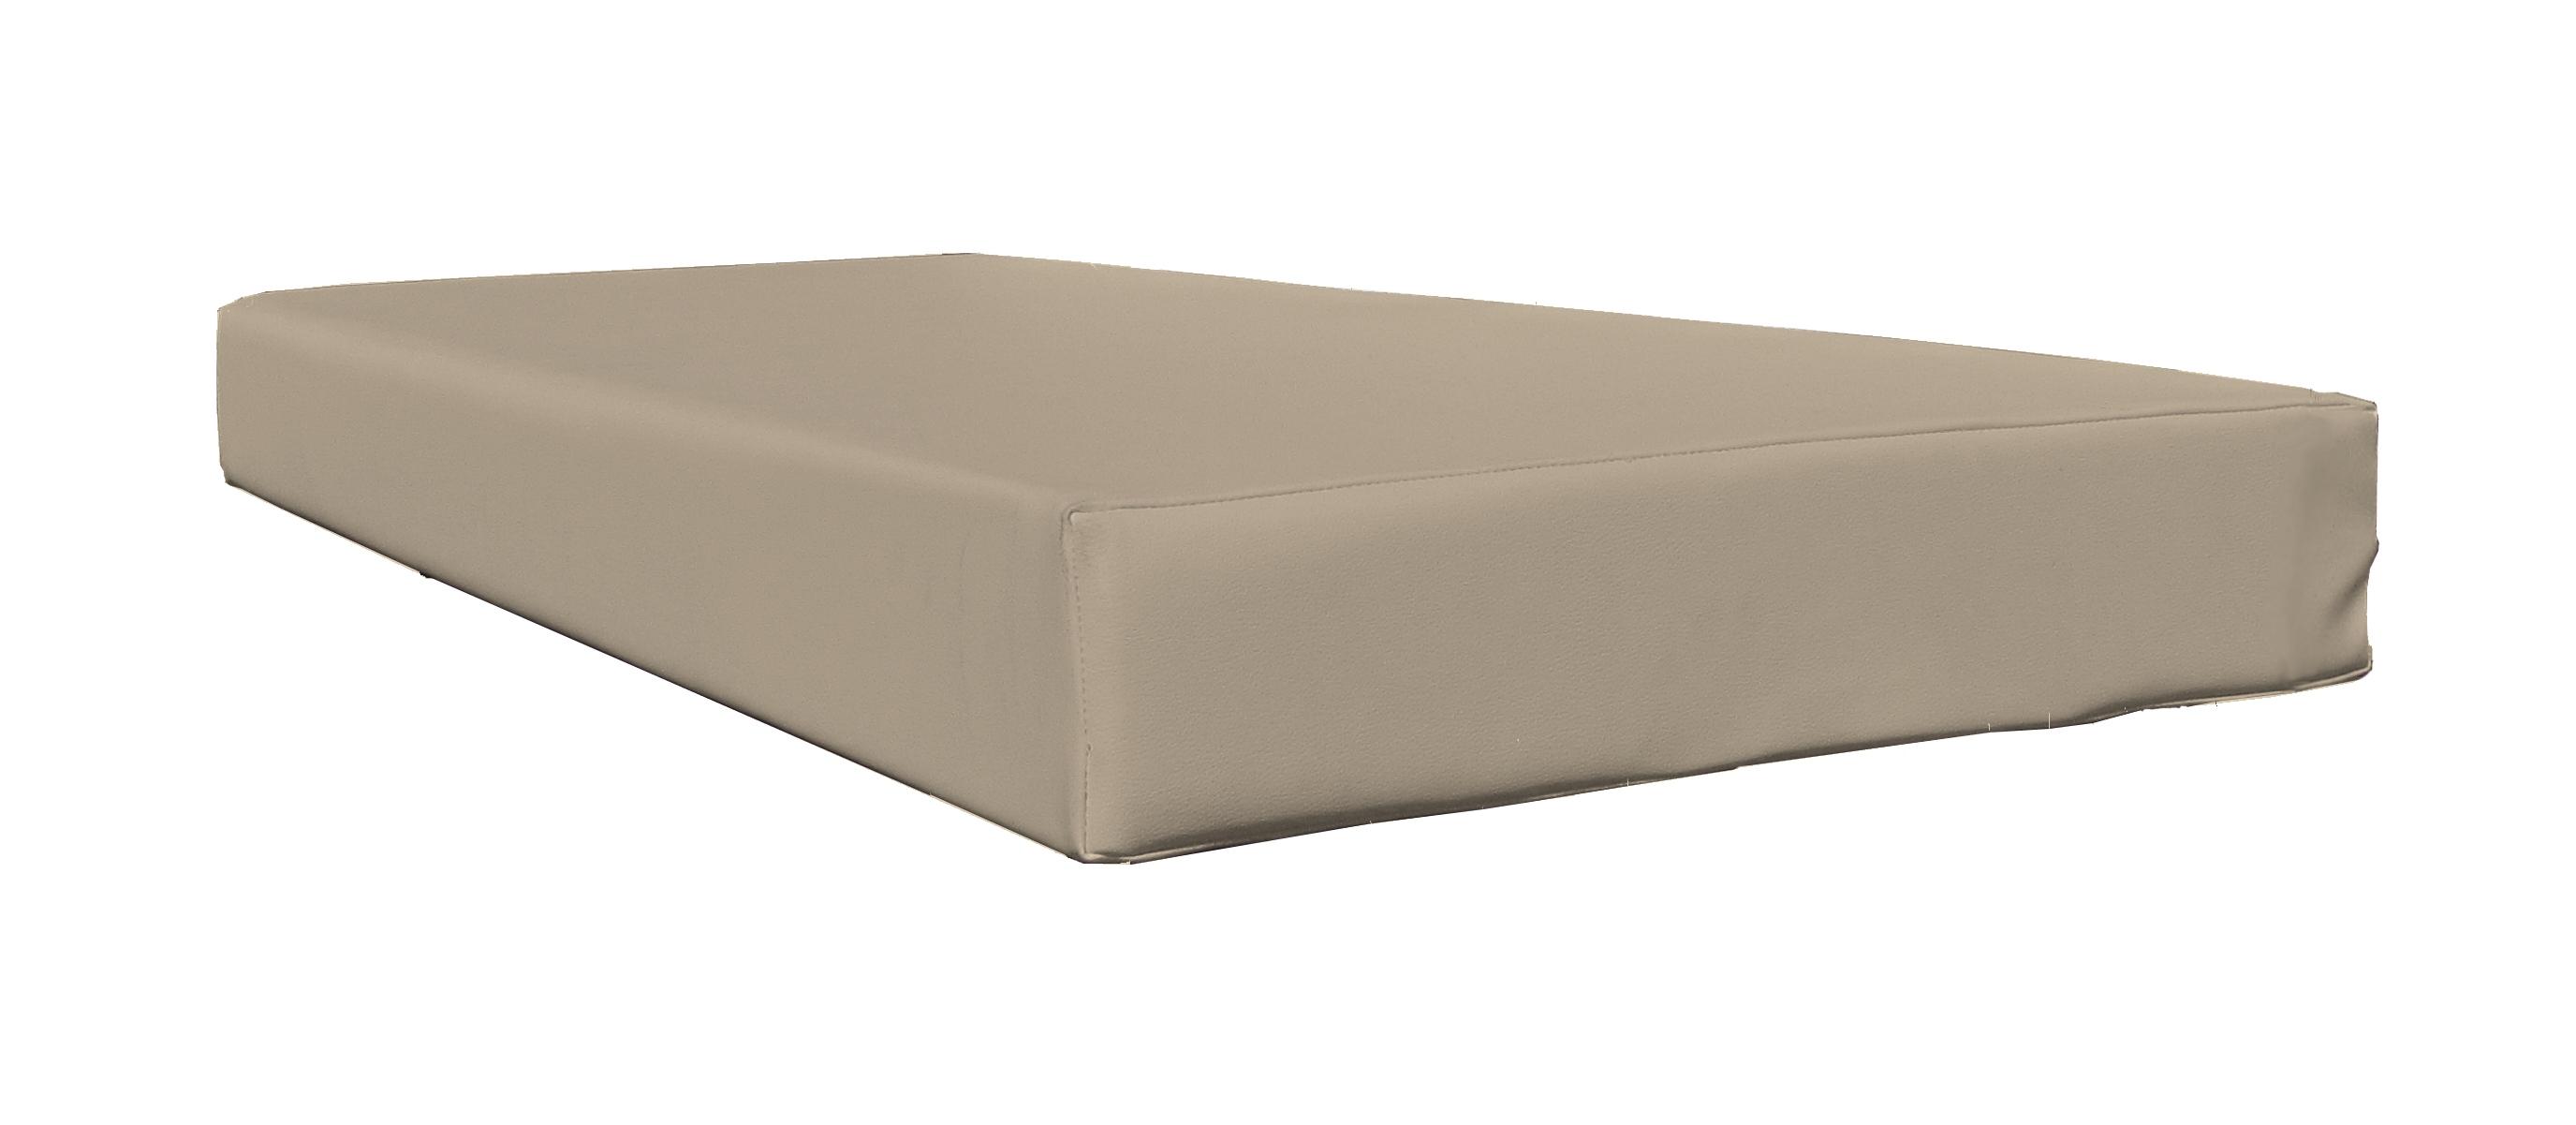 Coj n exterior para palet medida 120x80 for Cojin para sofa exterior